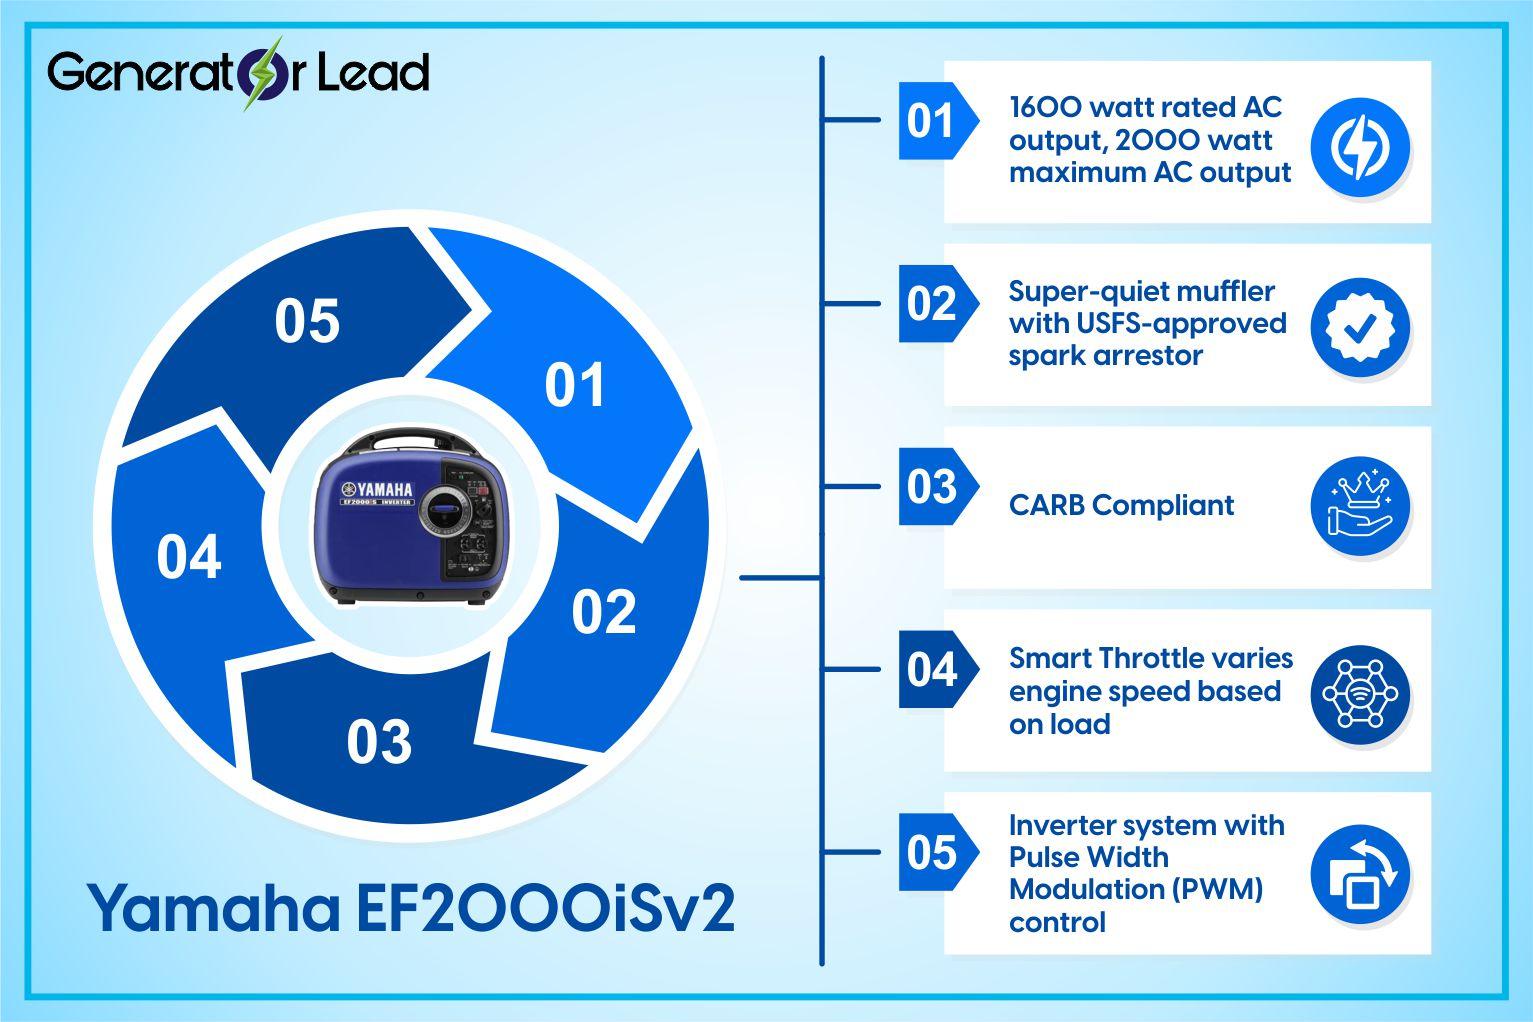 Yamaha EF2000iSv2 infographic detailes